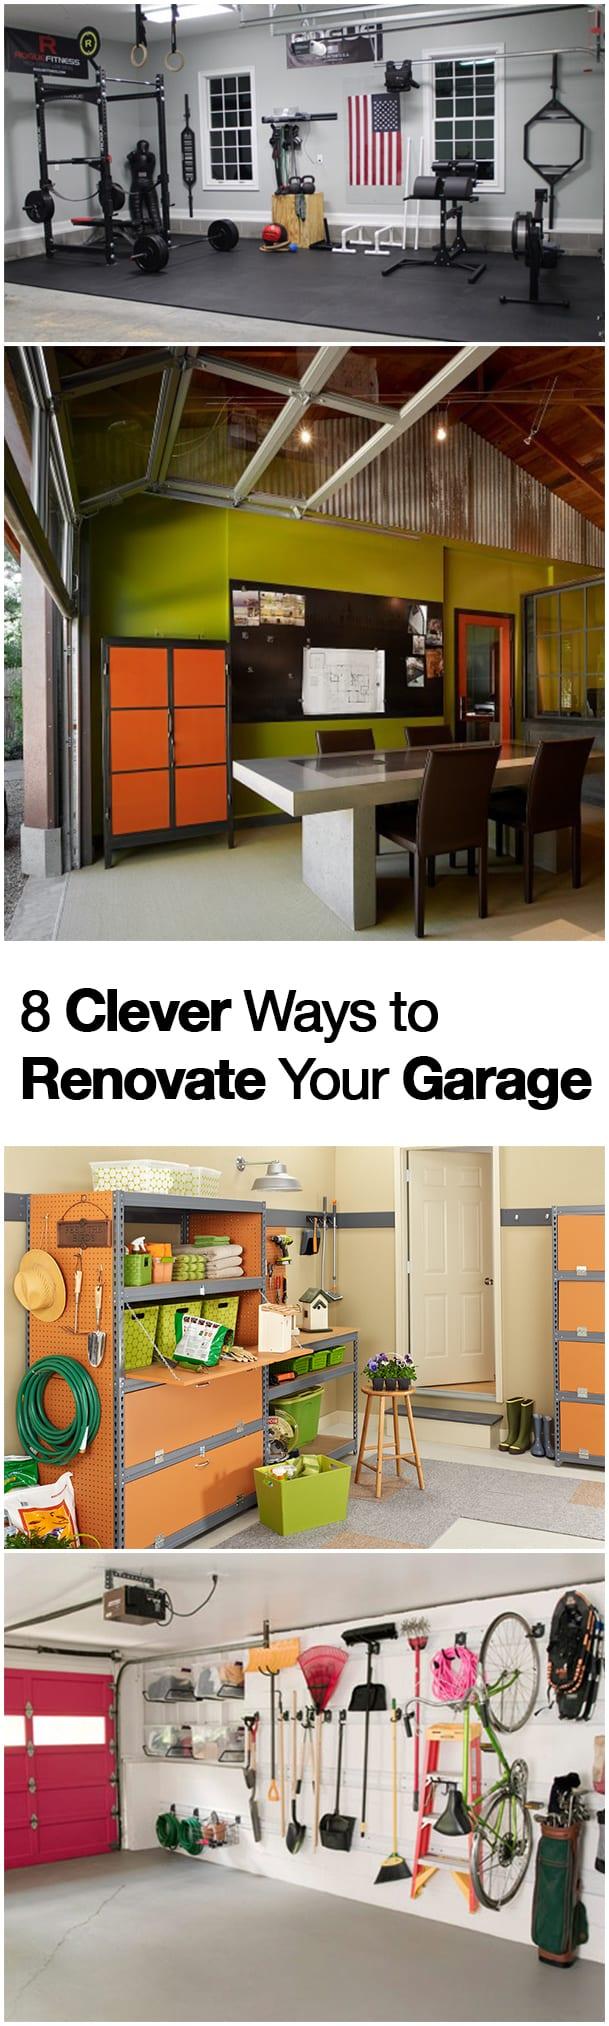 Garage remodel, garage storage, DIY garage projects, popular pin, organization, garage organization, DIY garage organization, easy storage hacks.